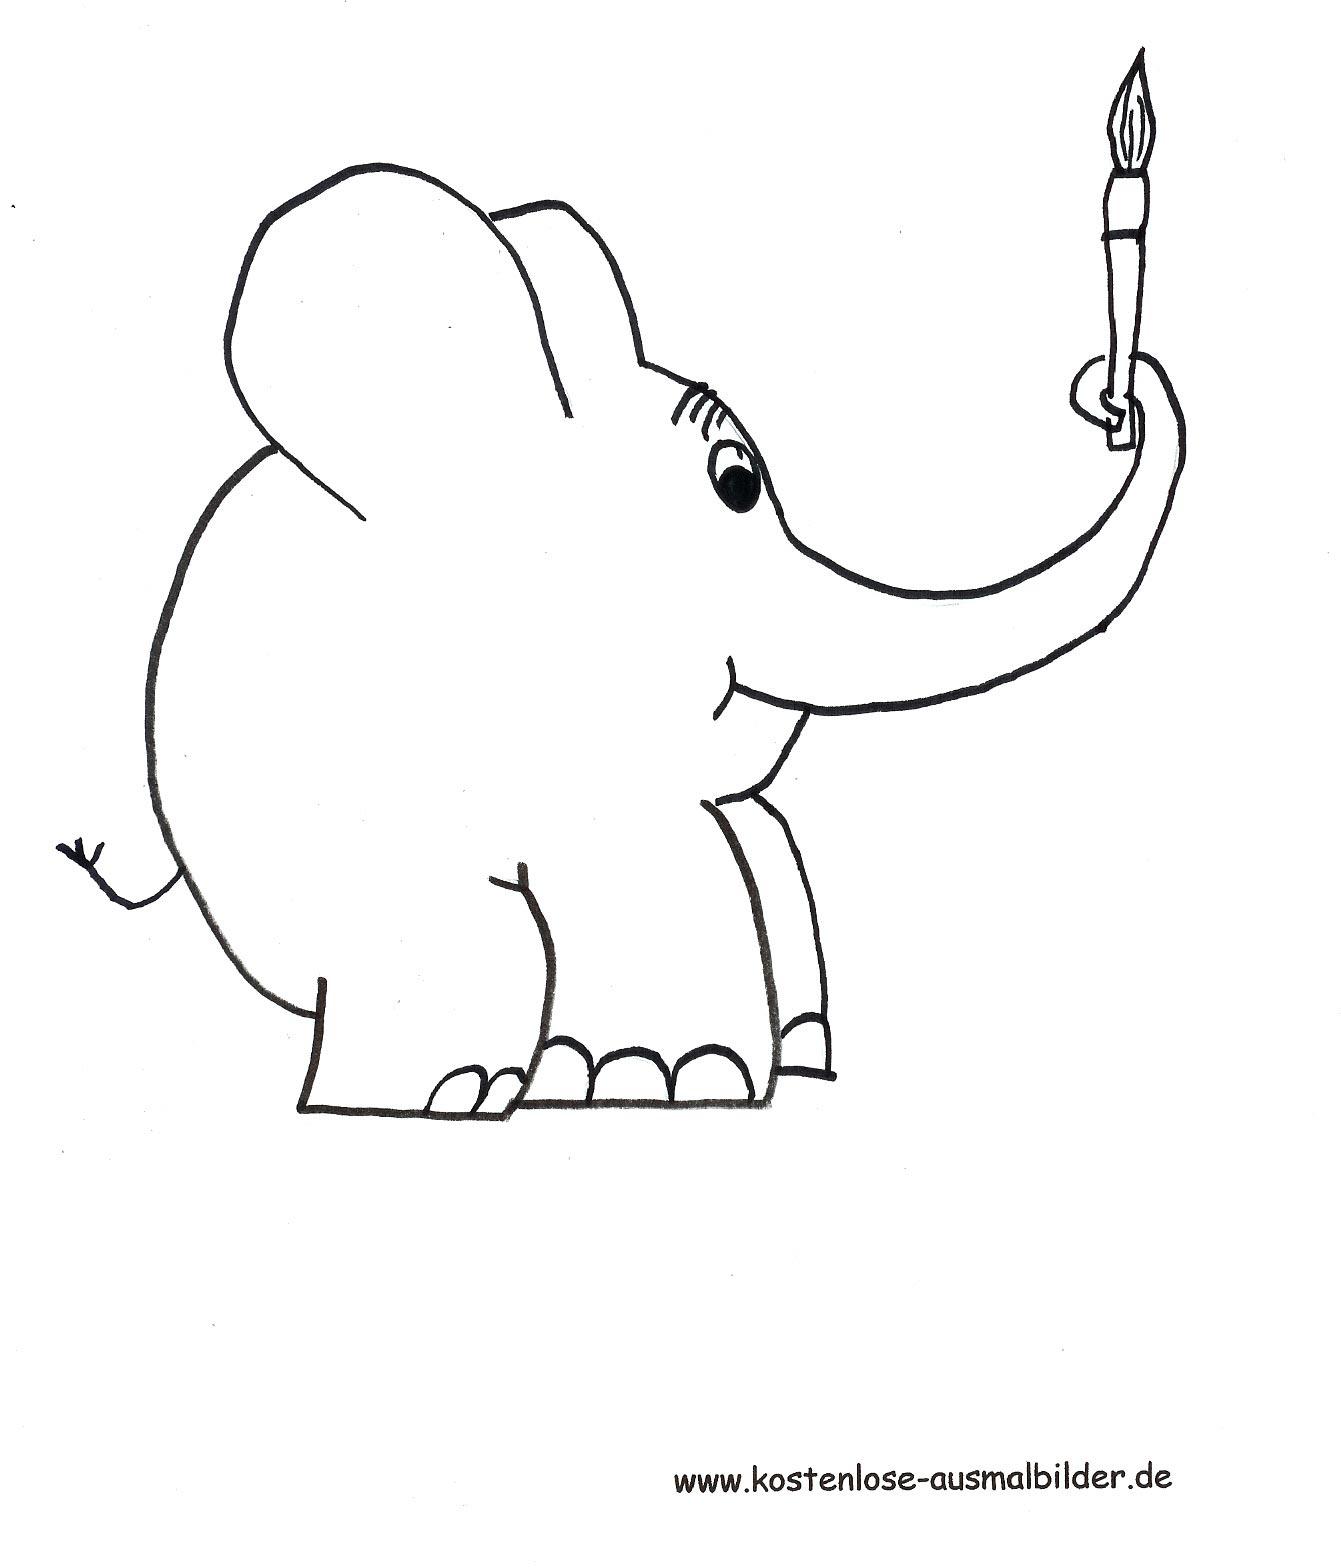 Gratis Malvorlagen Elefant